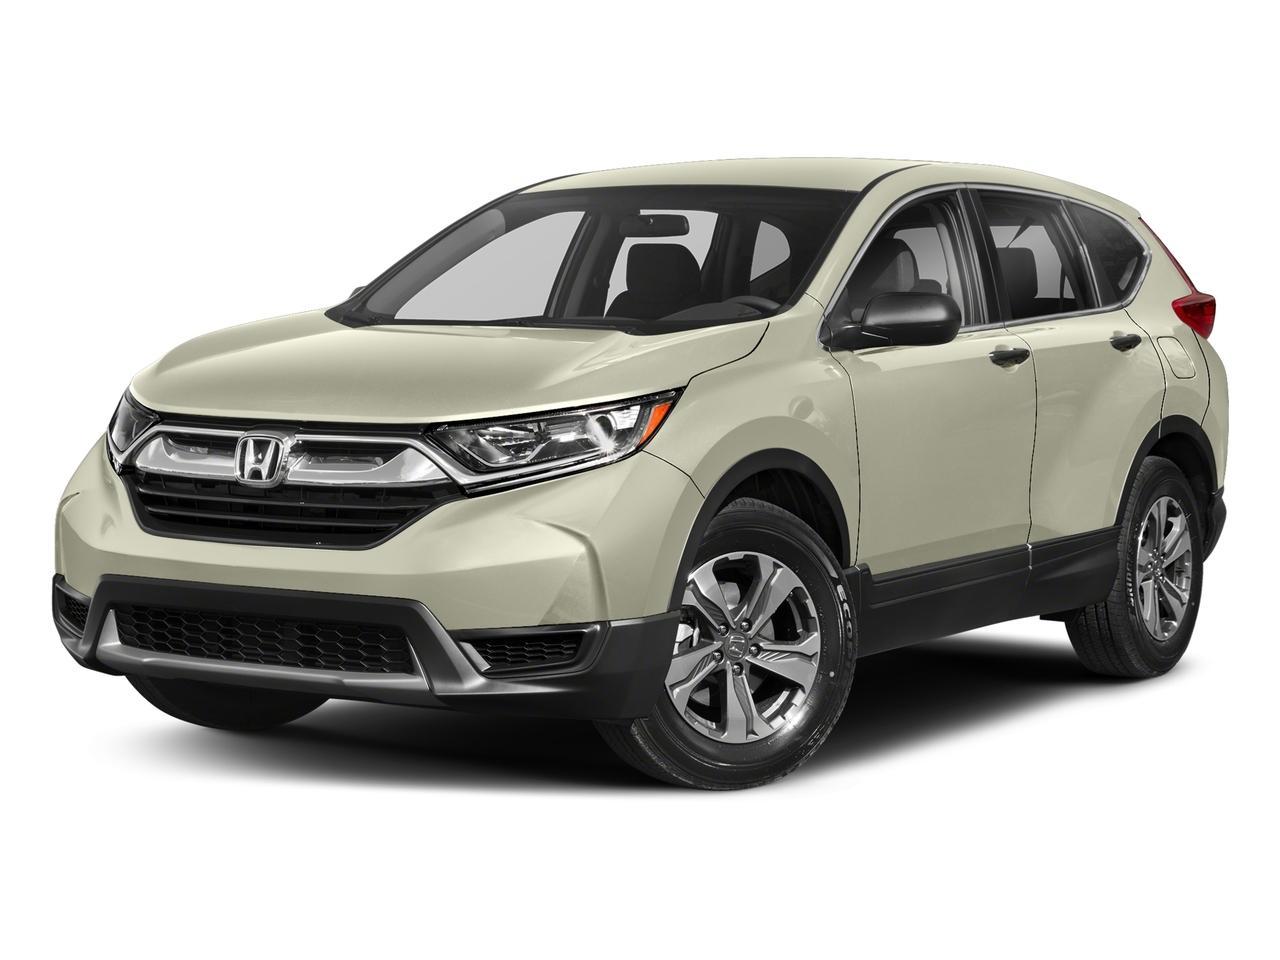 2018 Honda CR-V Vehicle Photo in Pleasanton, CA 94588